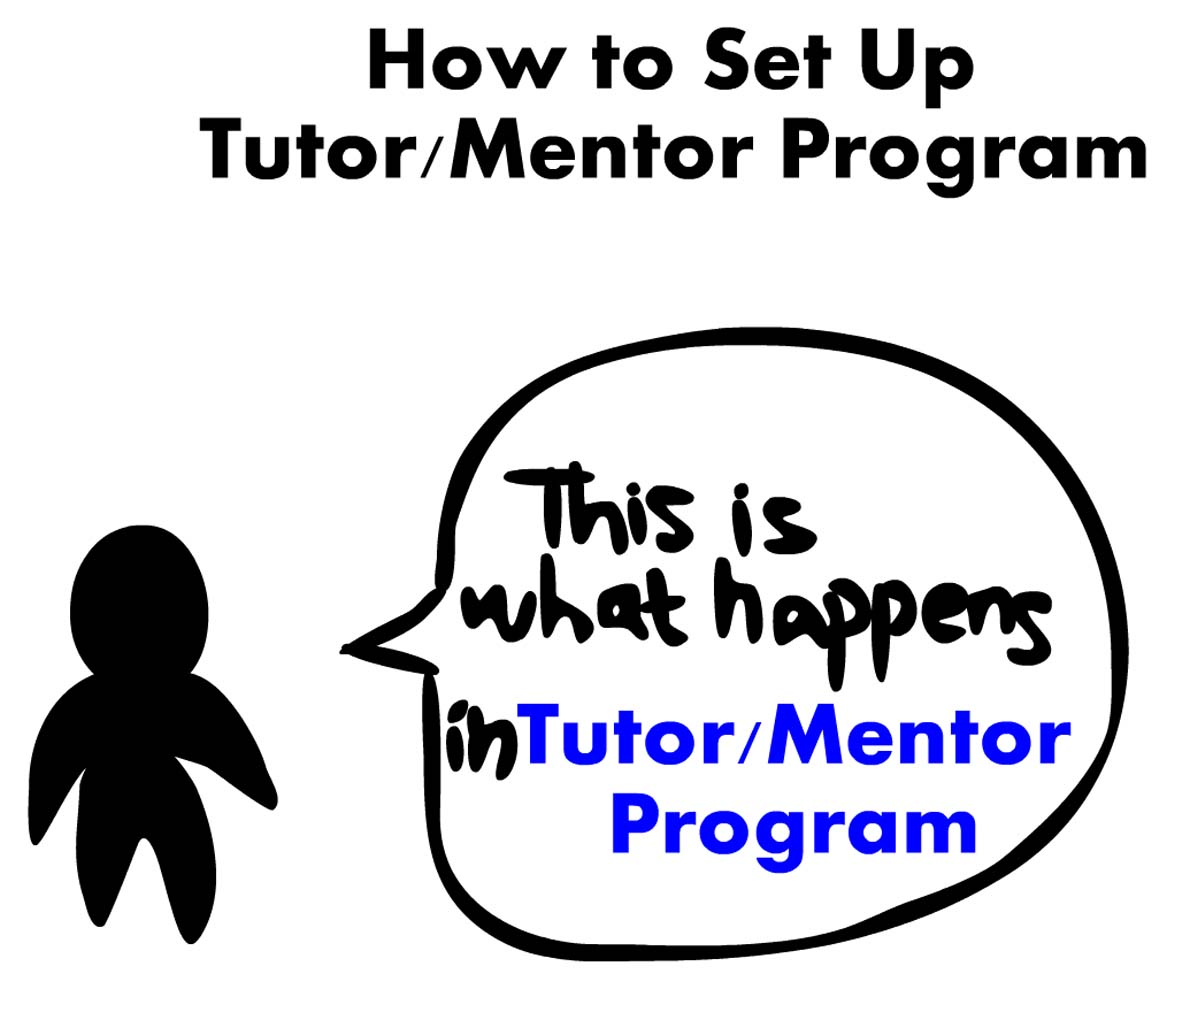 Tutor Mentor Institute, LLC: CNN Article Questions Quin's